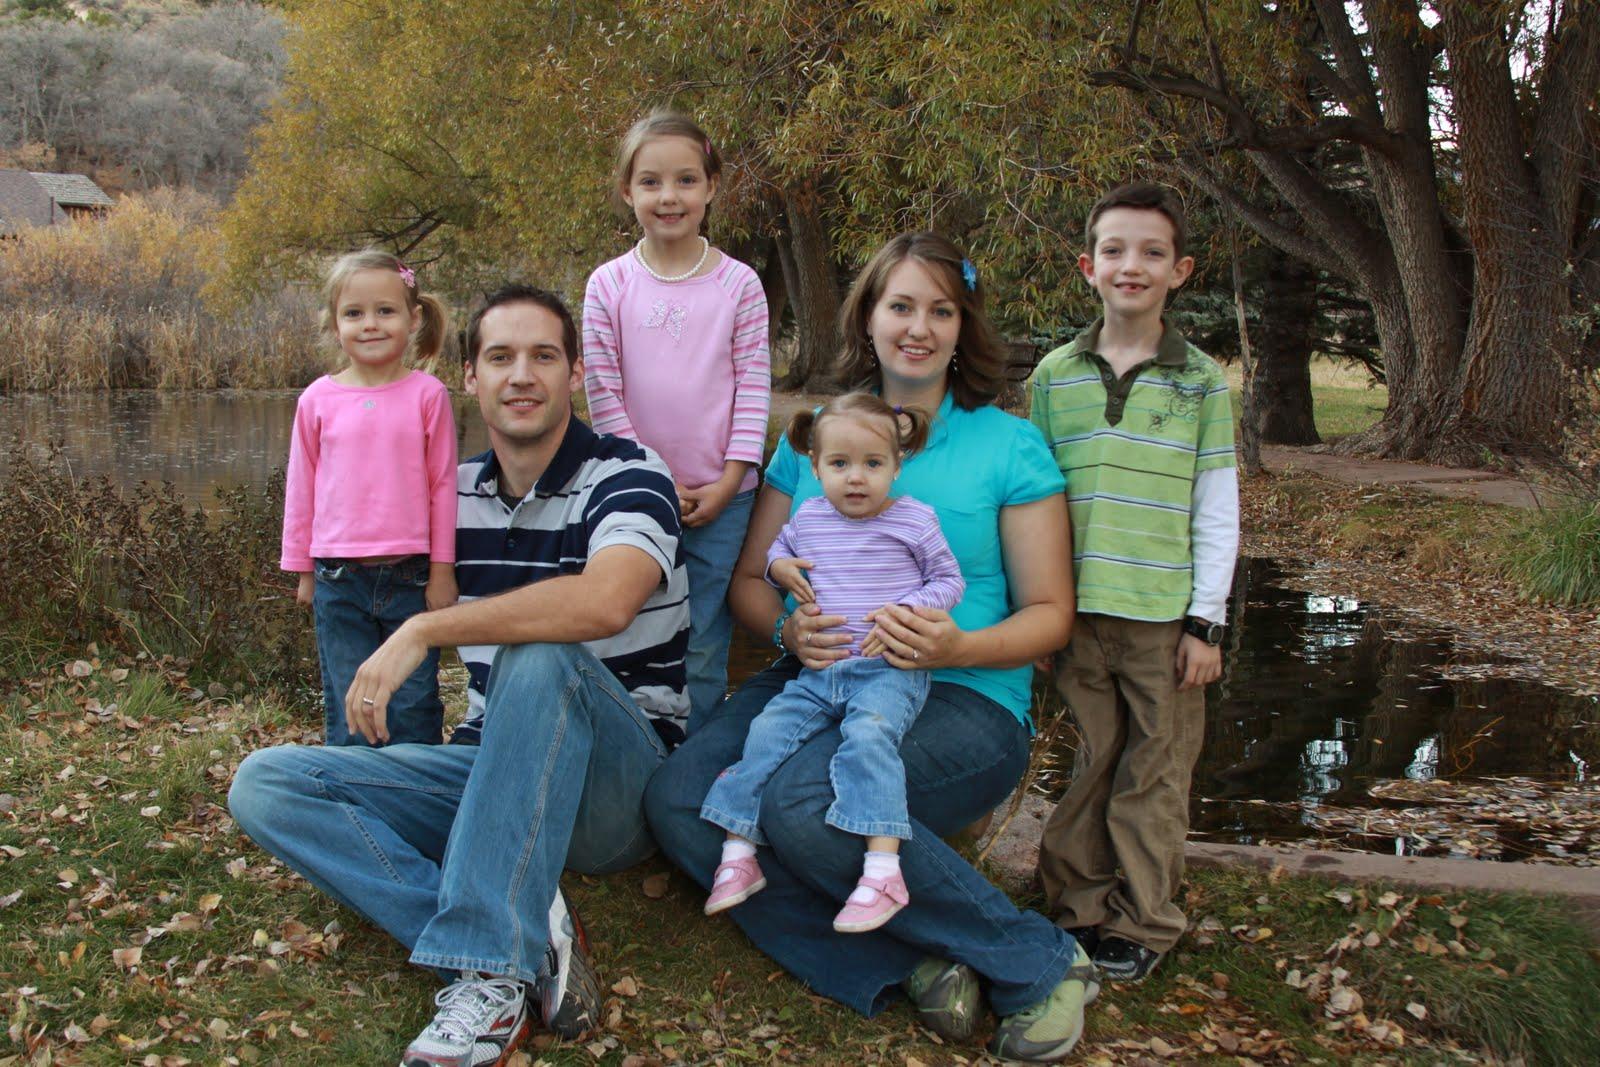 Cottongim family